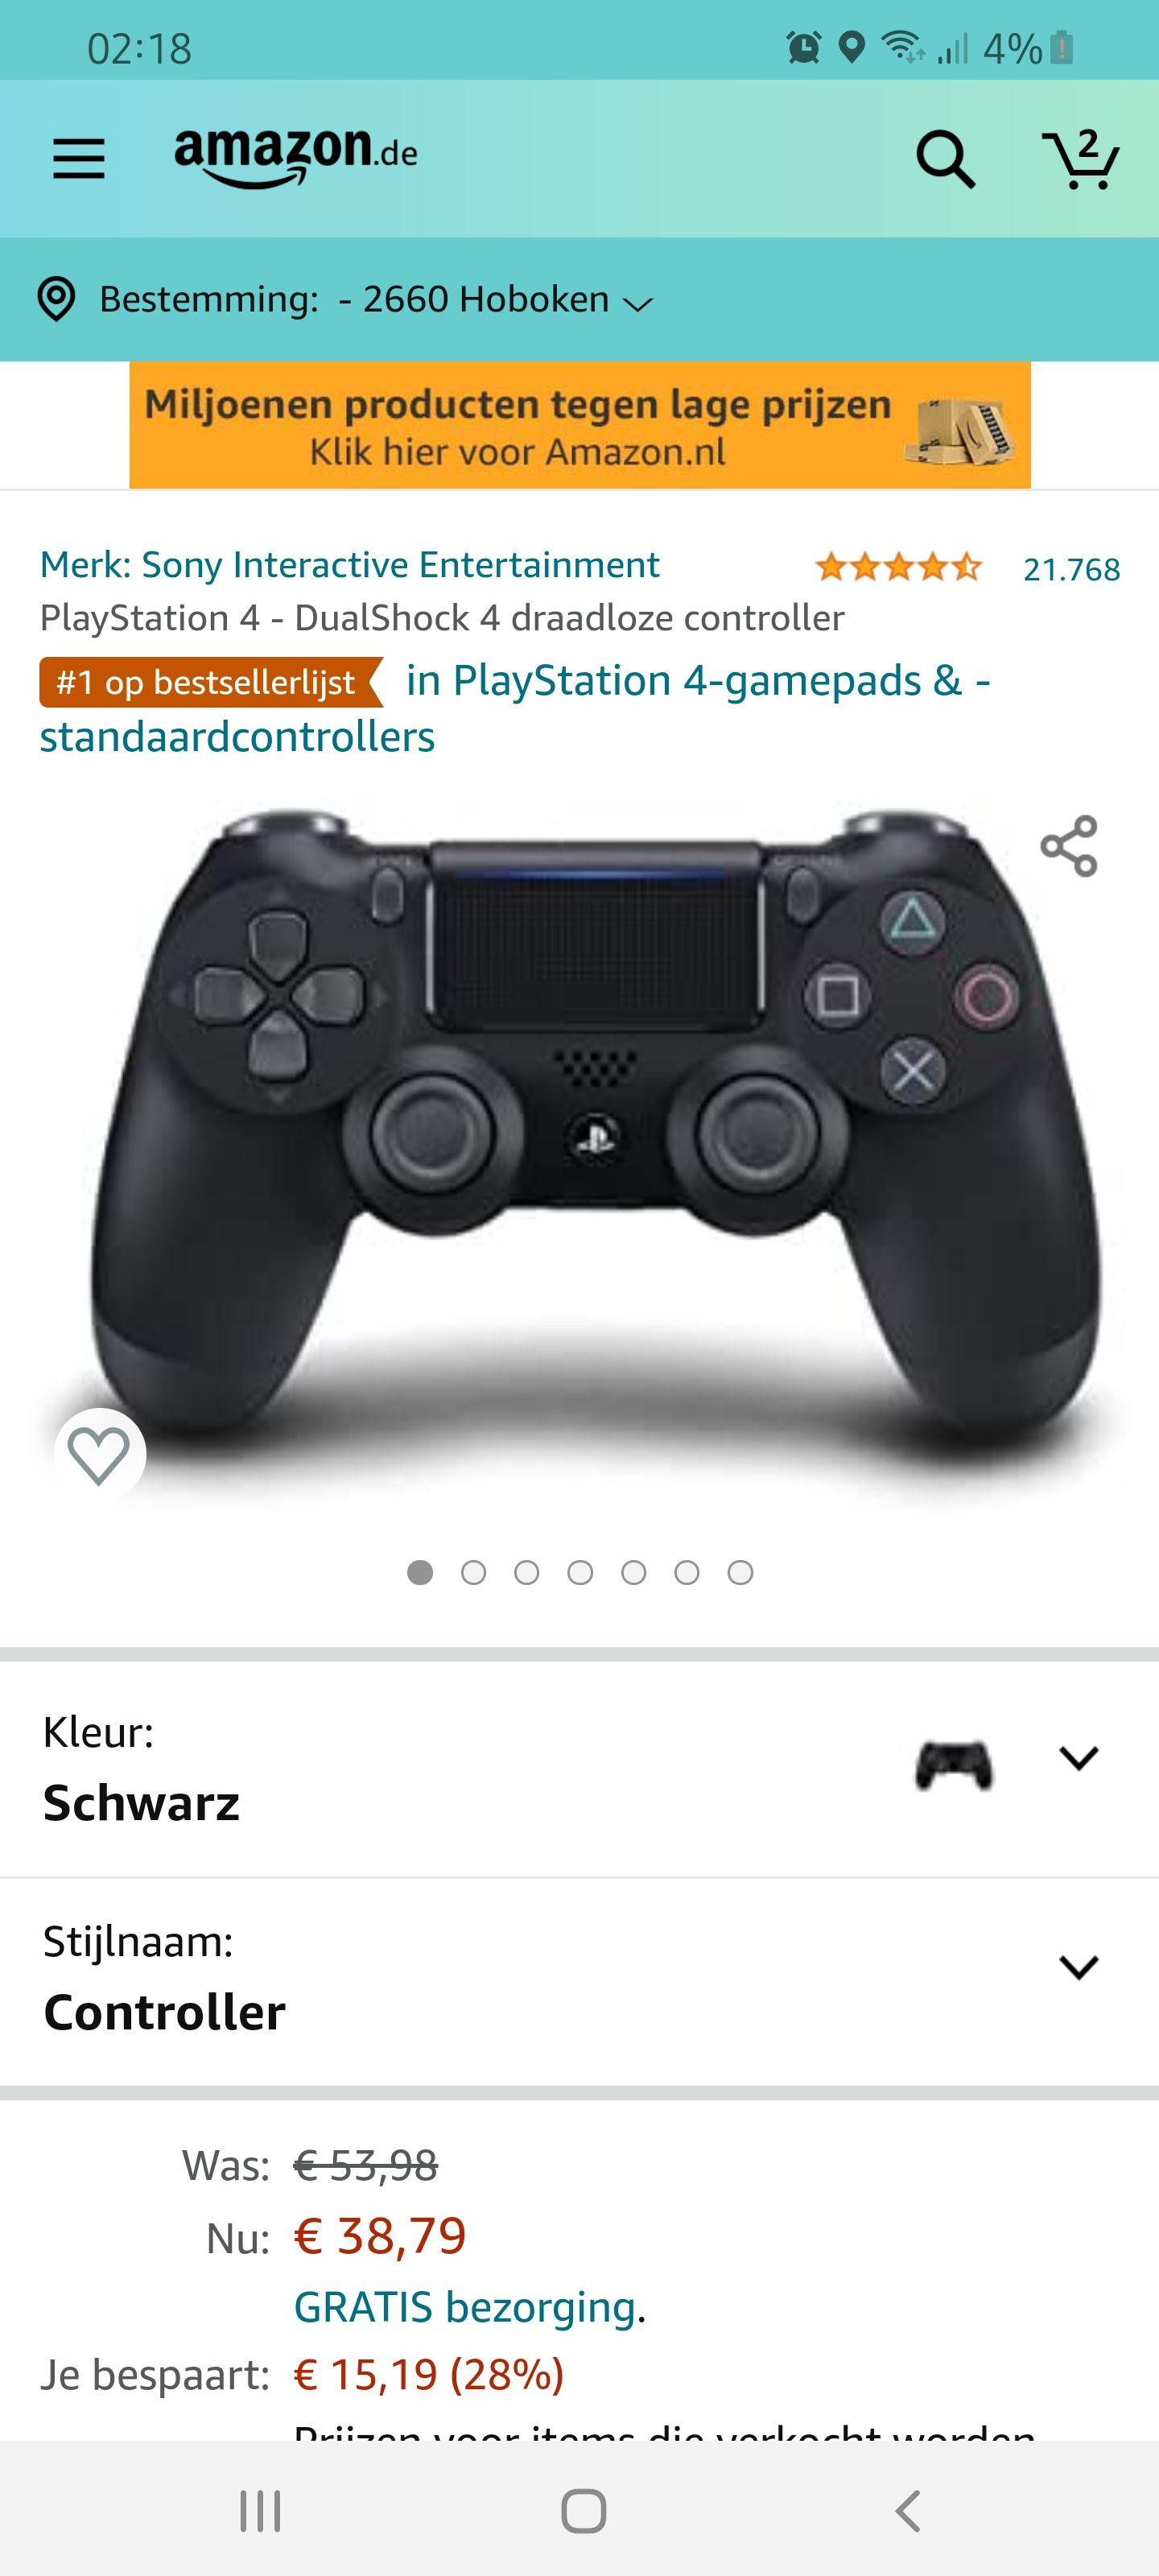 PlayStation 4 DualShock 4 draadloze controller